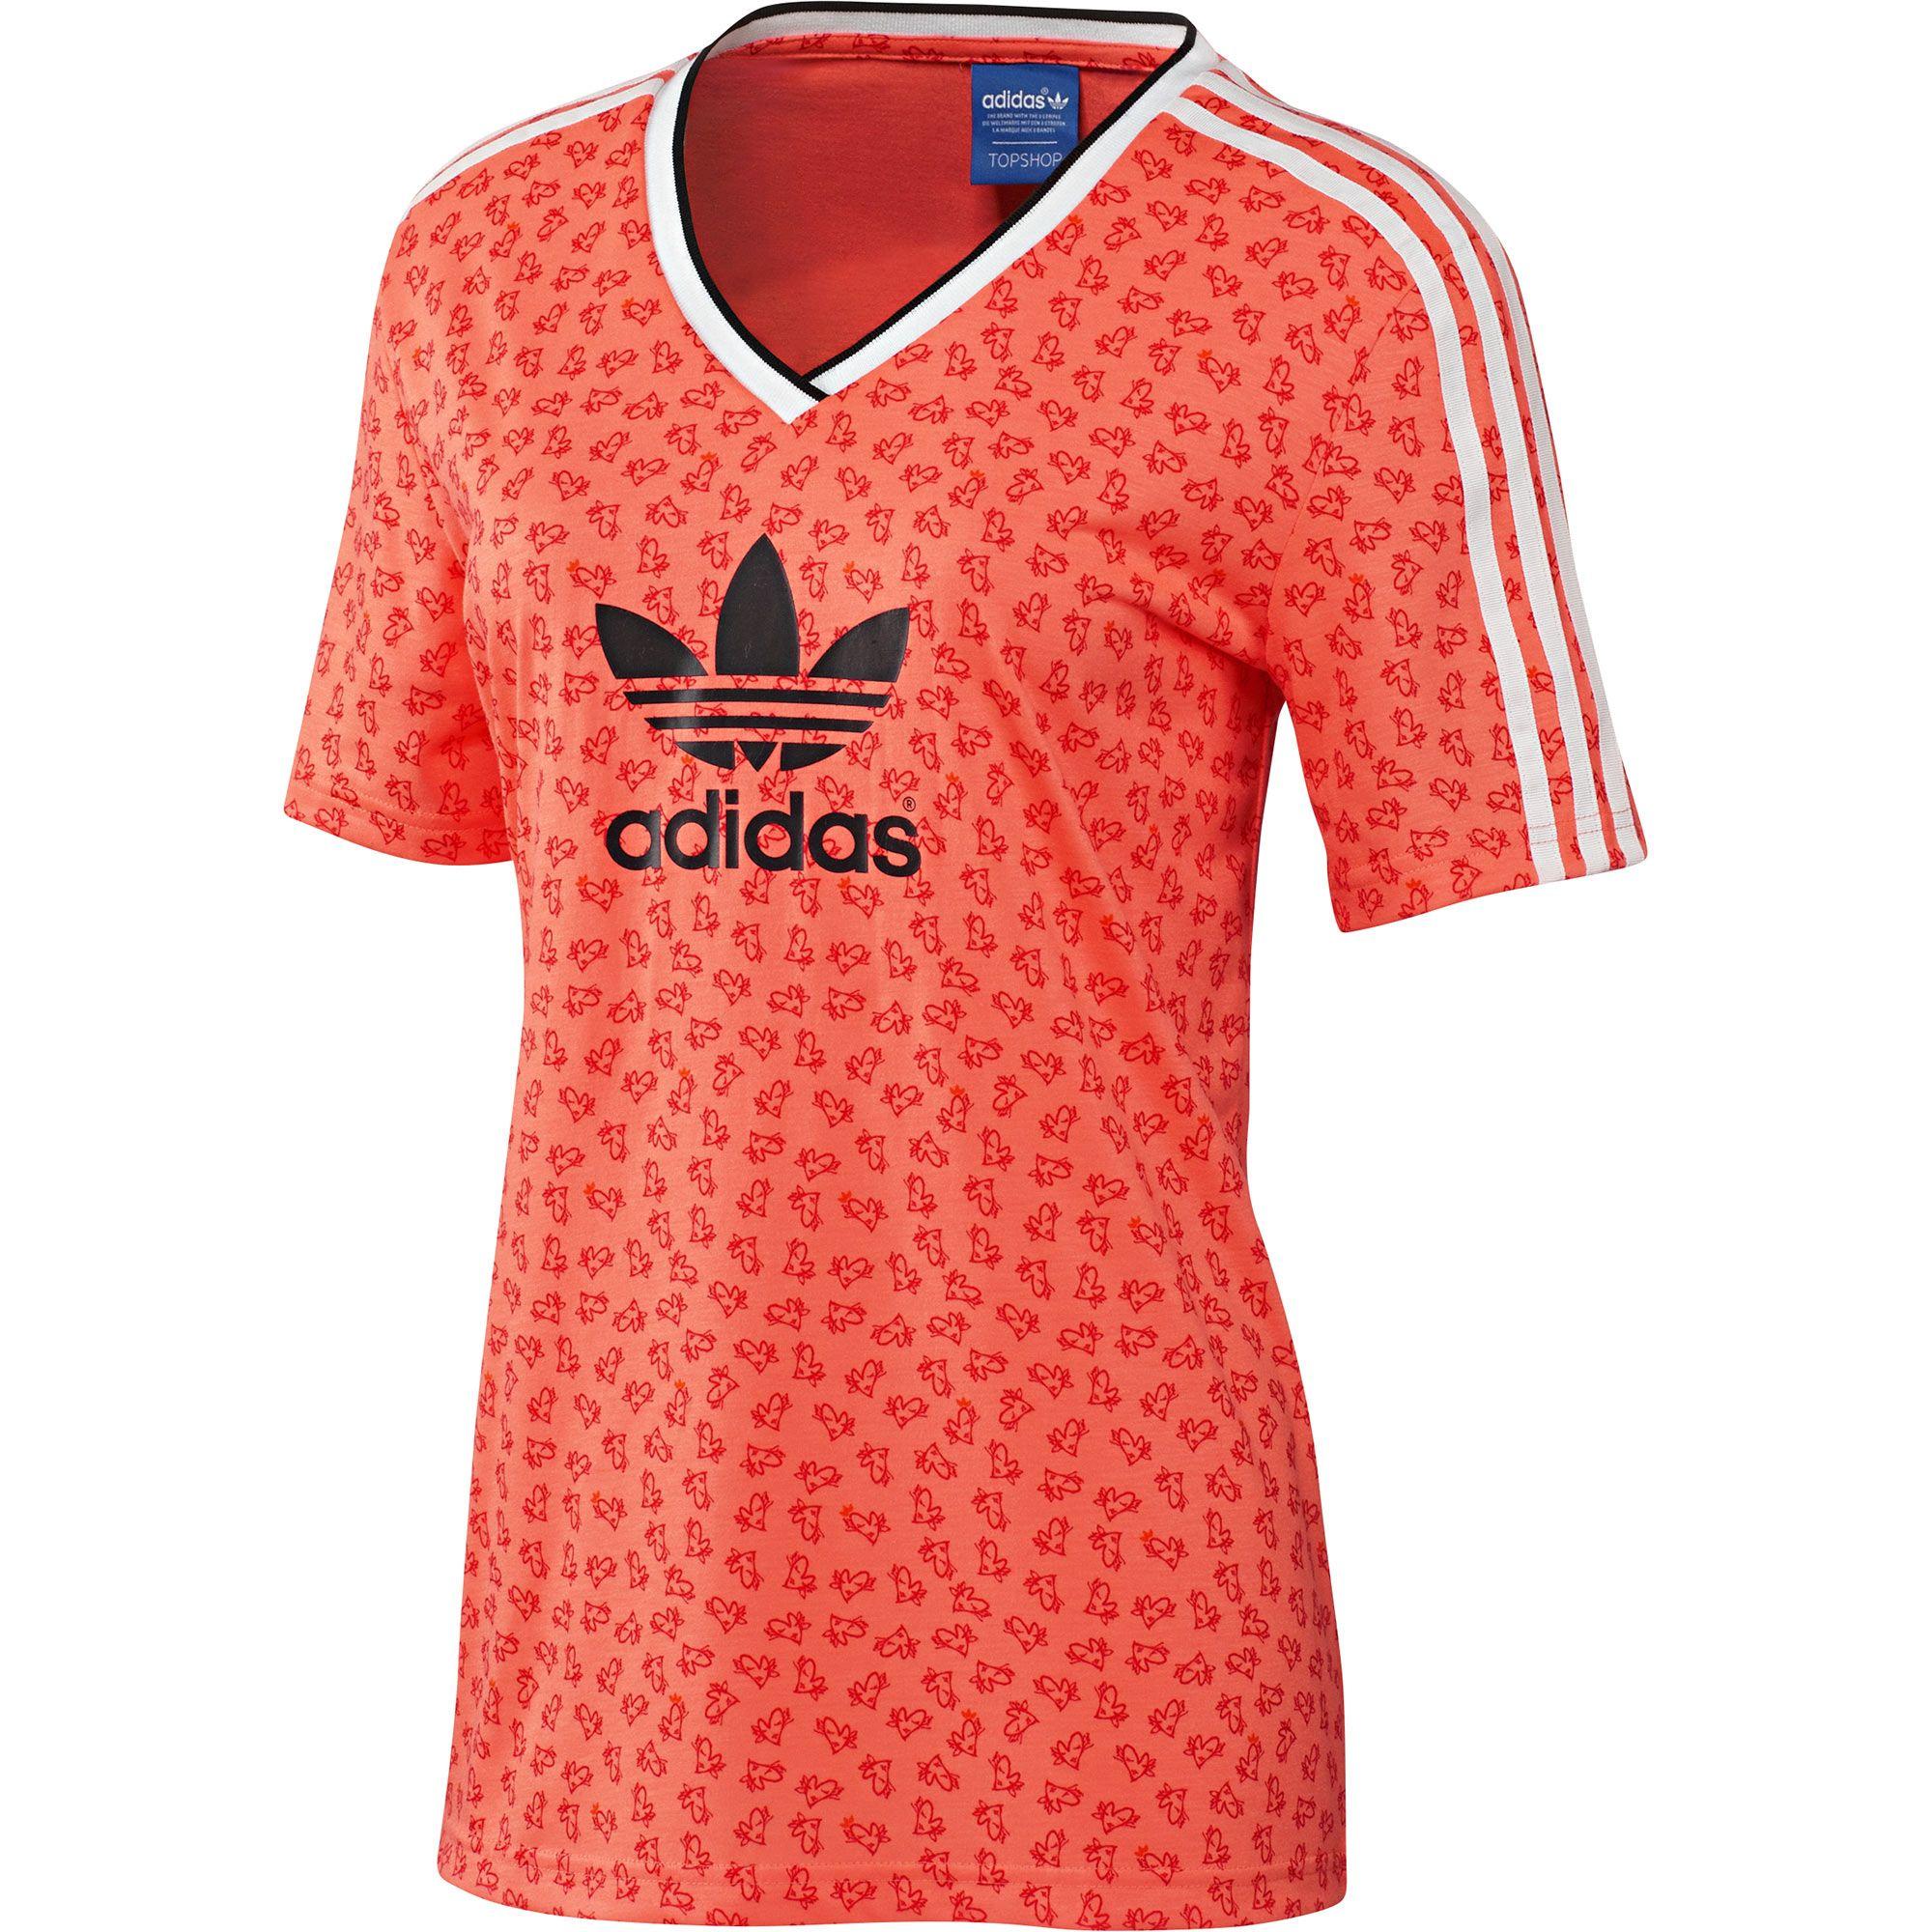 6f77be3d9a89b adidas x Topshop Camiseta de fútbol con cuello de pico adidas ...